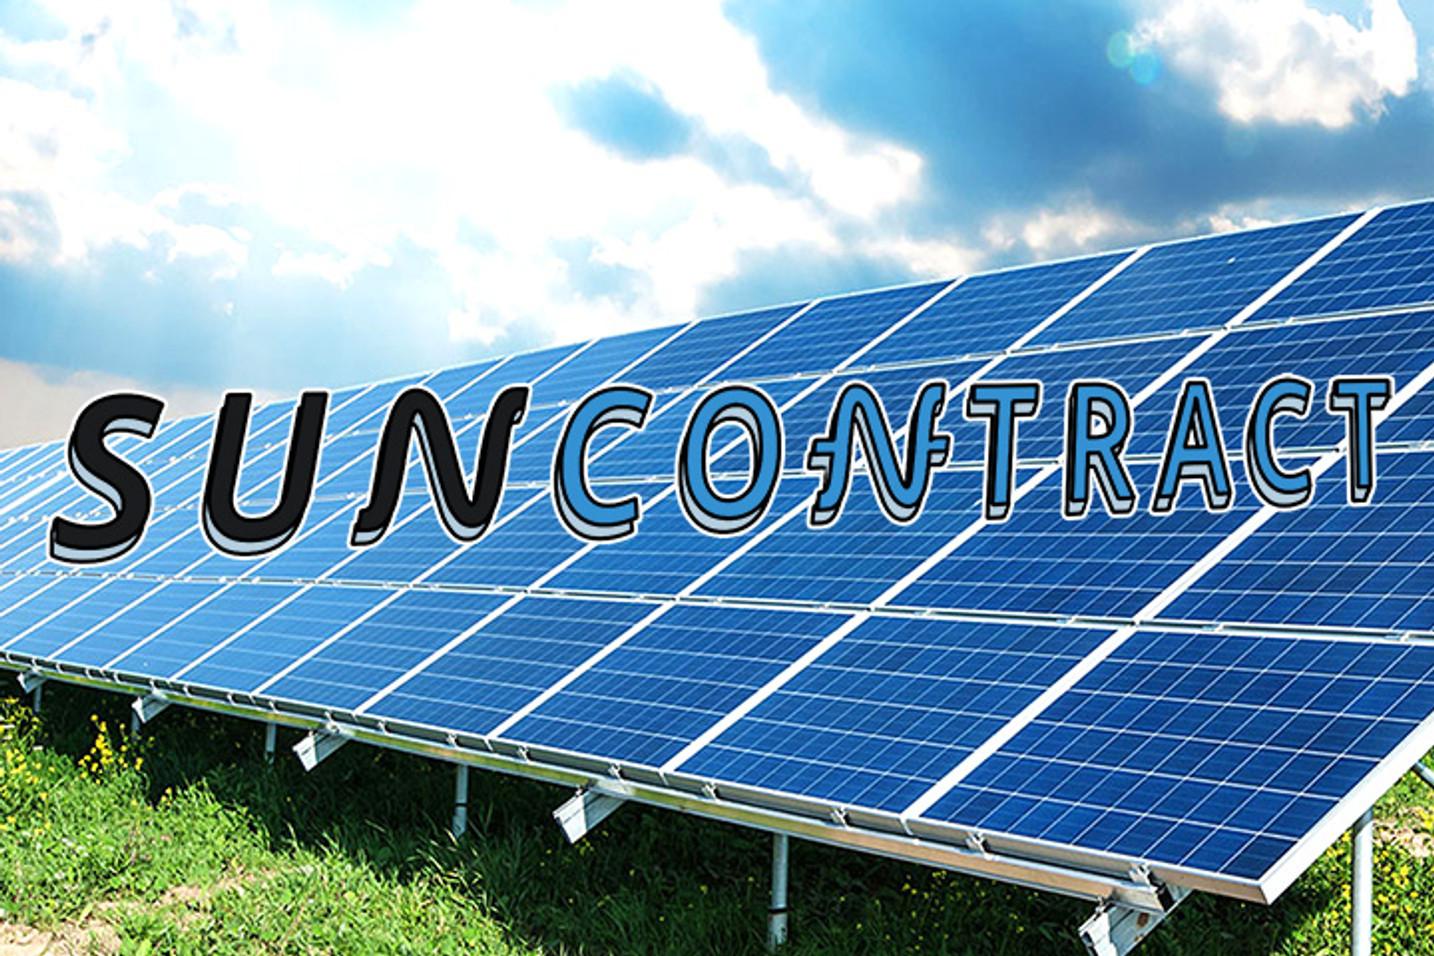 SunContract Announces Tokensale (ICO) For June 28th